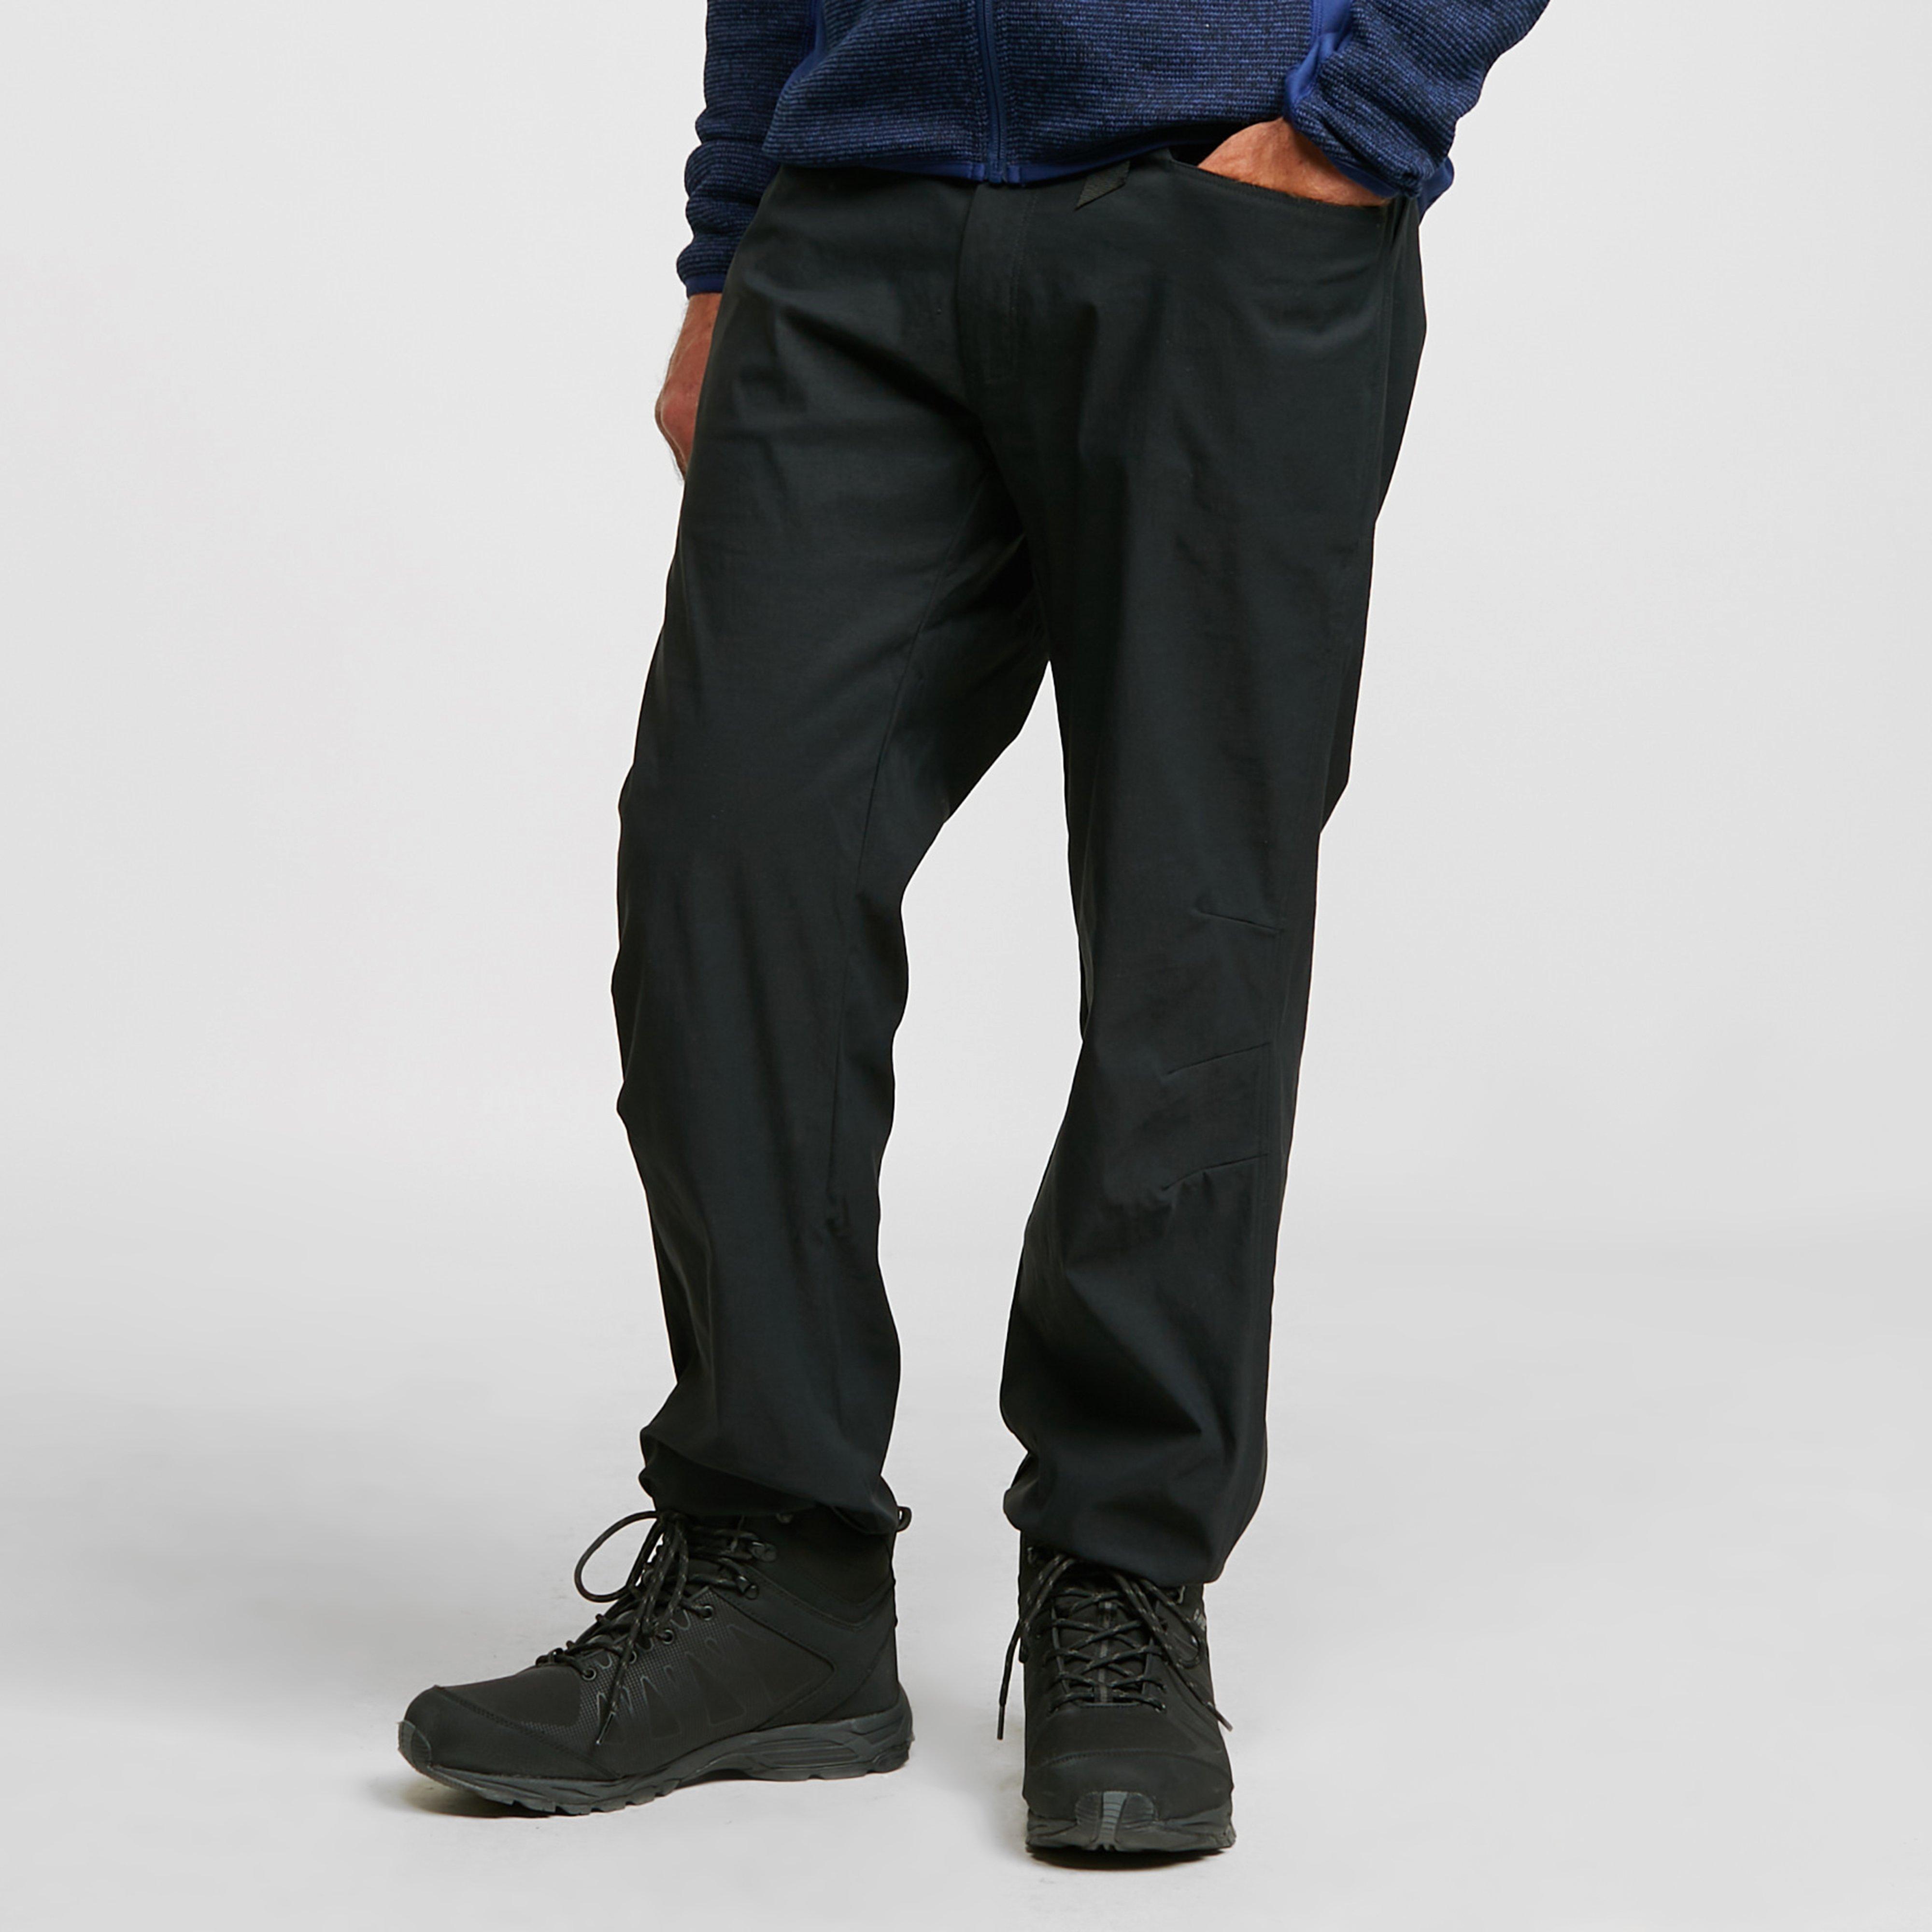 Peter Storm Mens High Loft Softshell Jacket - Black  Black